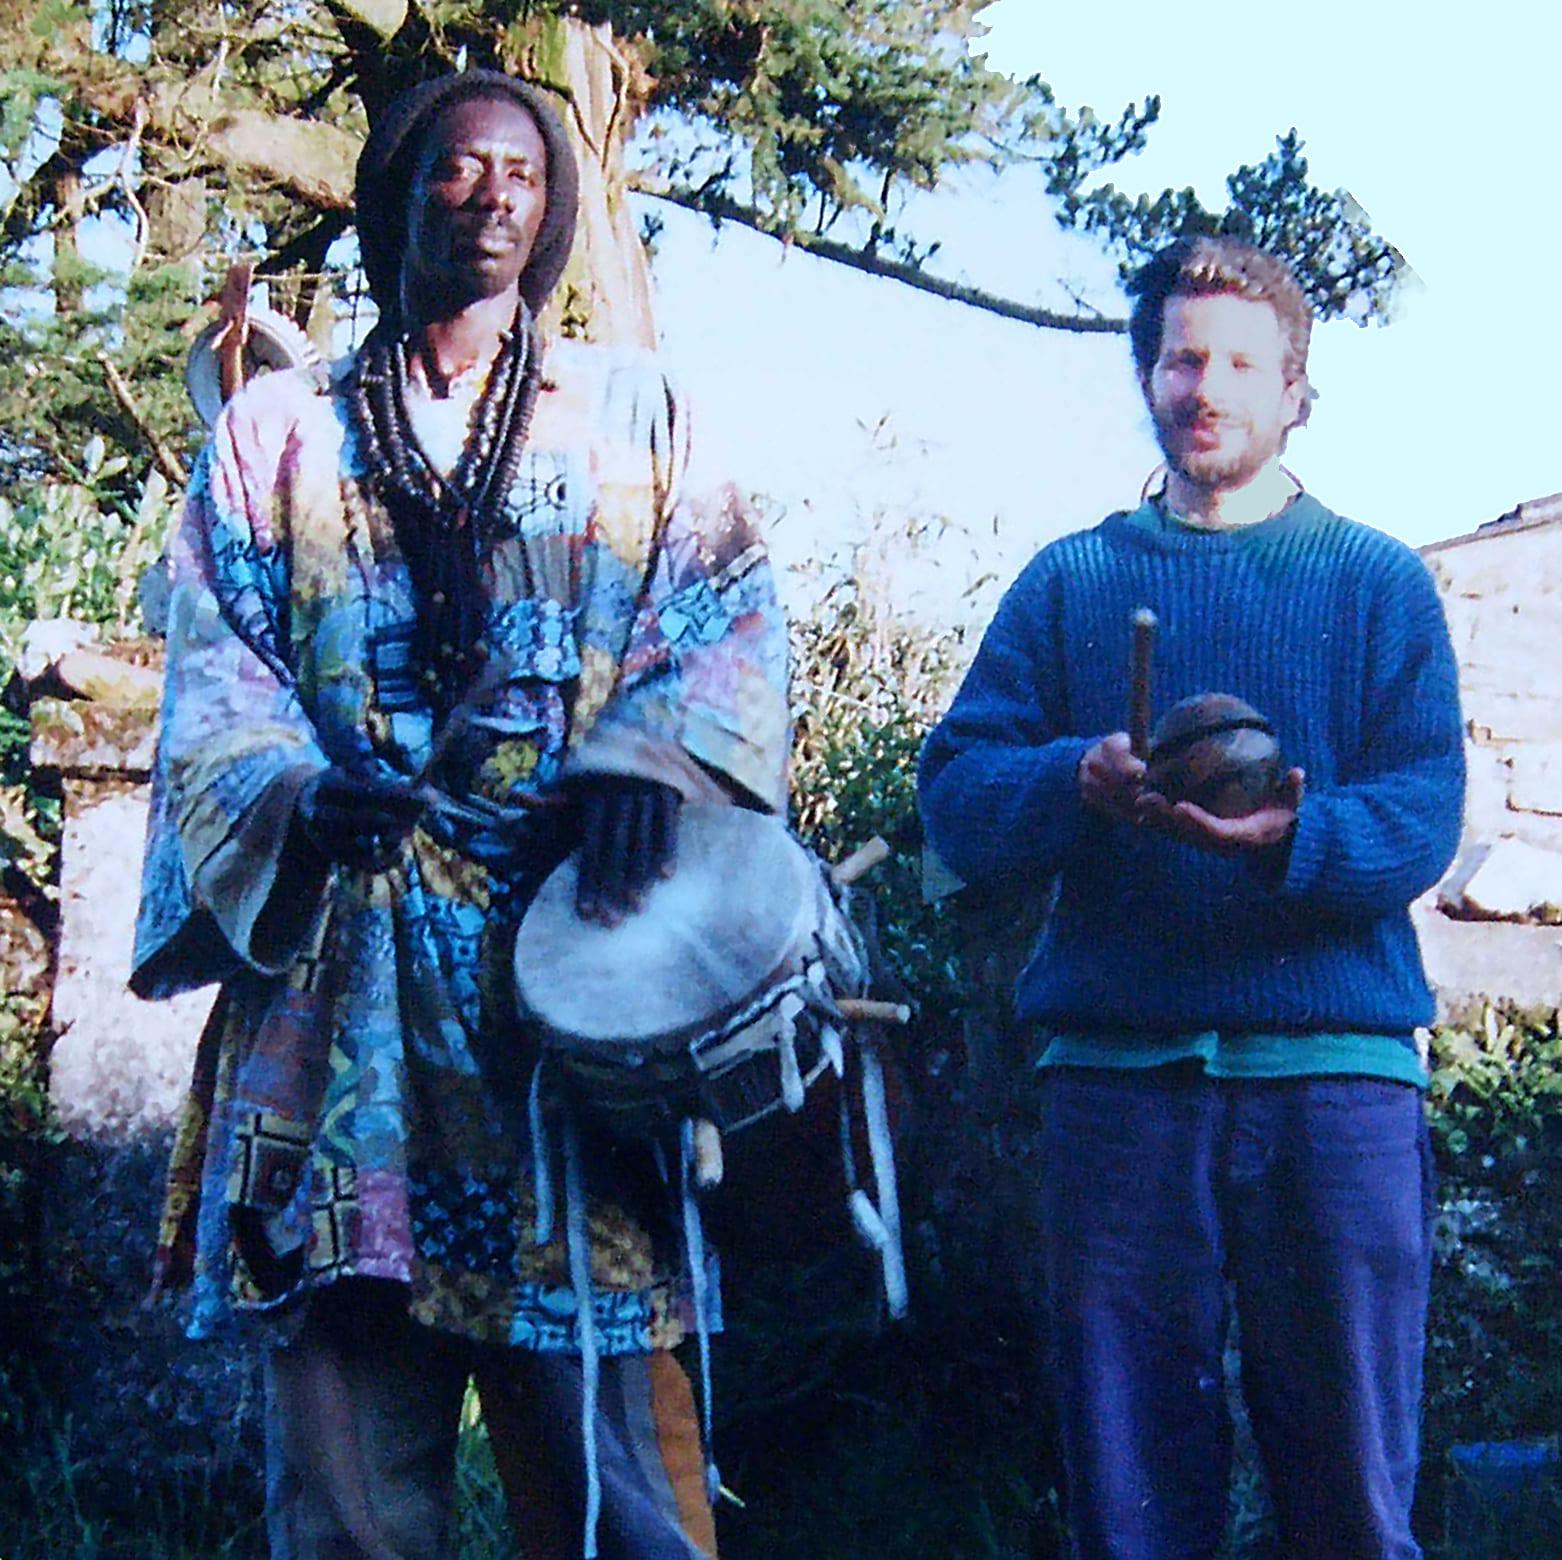 Demba Sow + Thomas - 1998